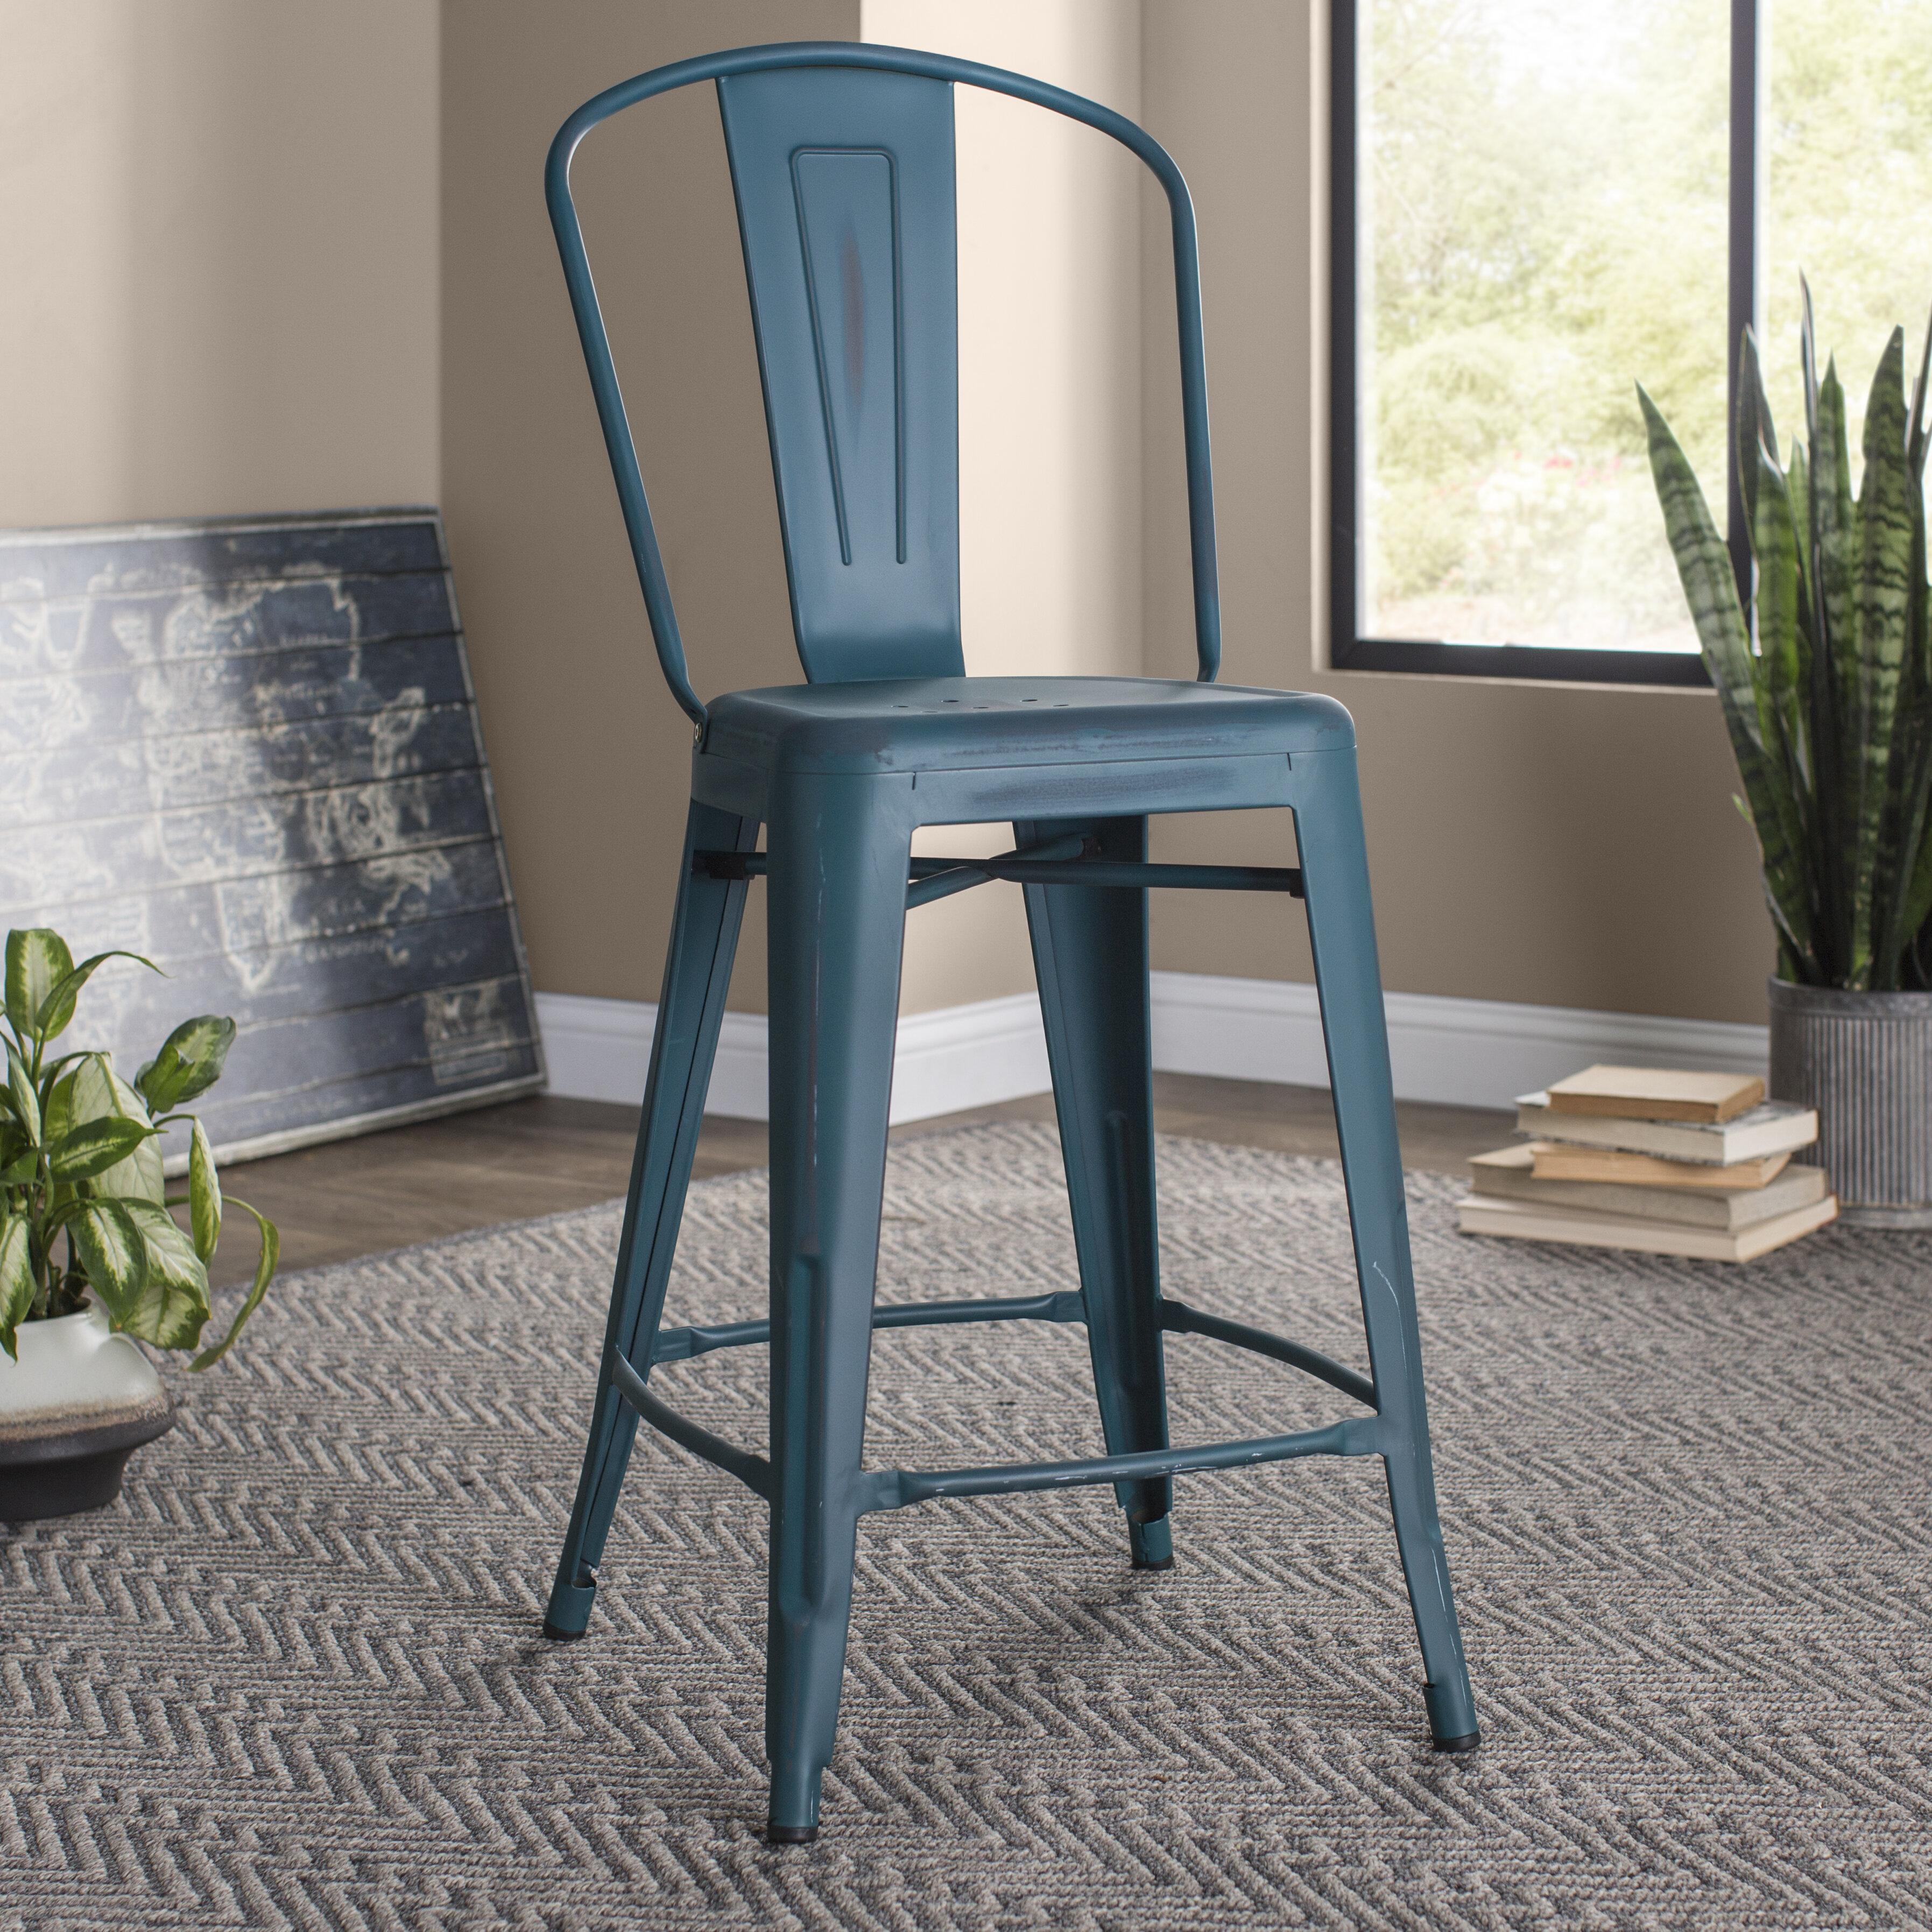 Fantastic Dovercliff Bar Counter Stool Beatyapartments Chair Design Images Beatyapartmentscom